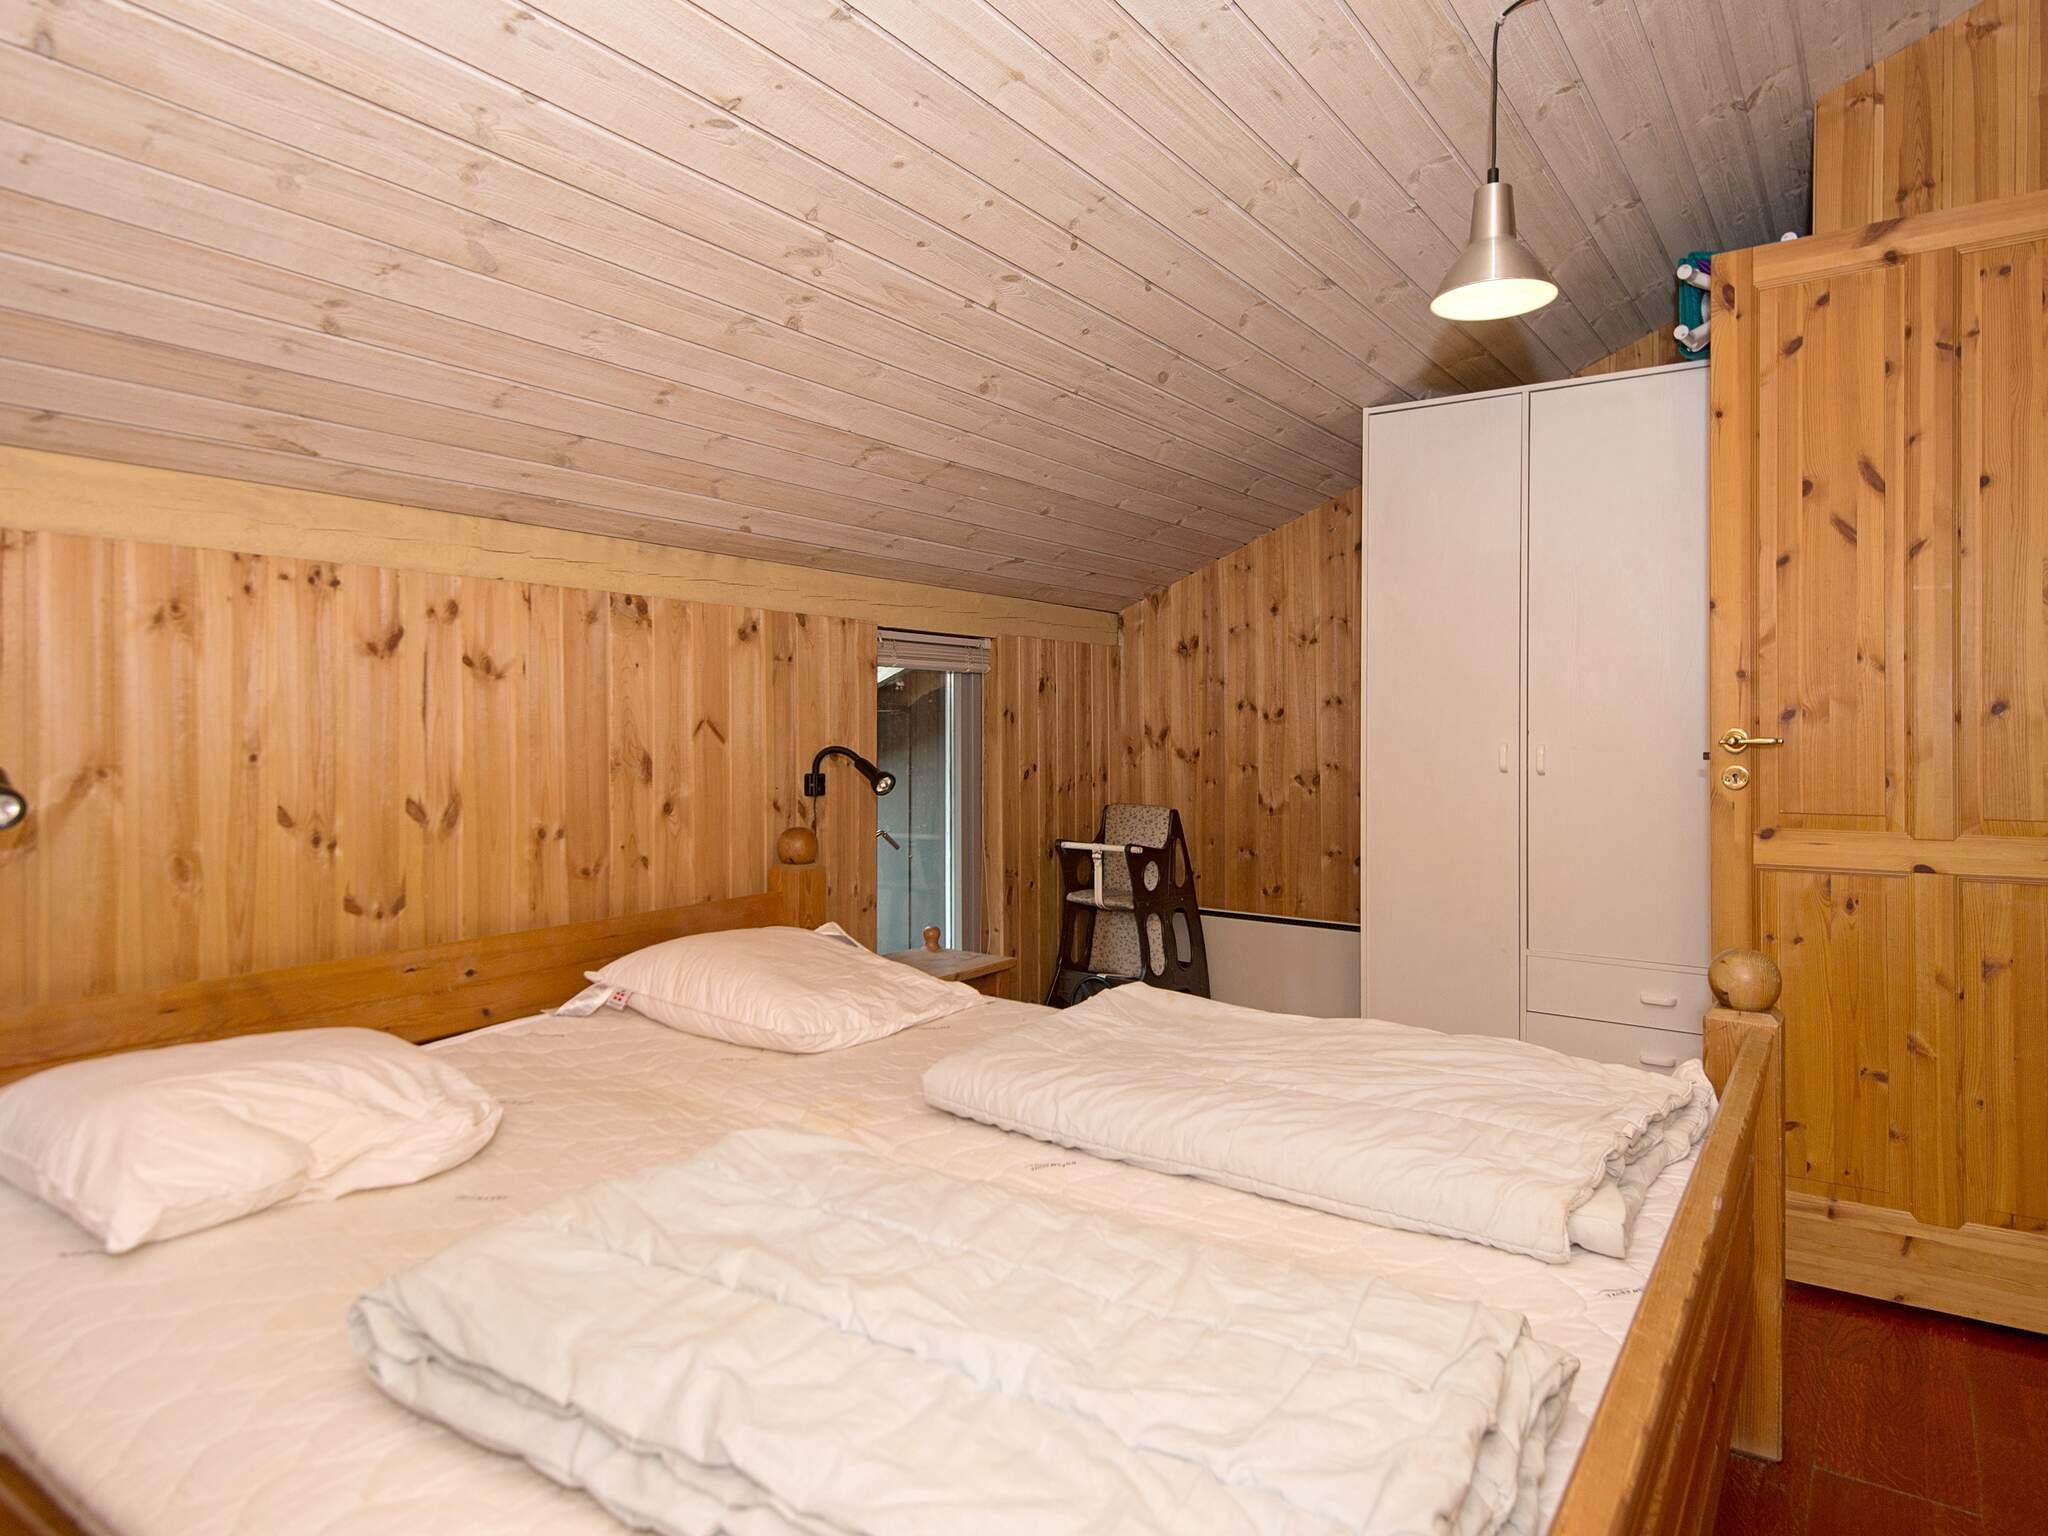 Ferienhaus Kølkær (87697), Kølkær, , Westjütland, Dänemark, Bild 19